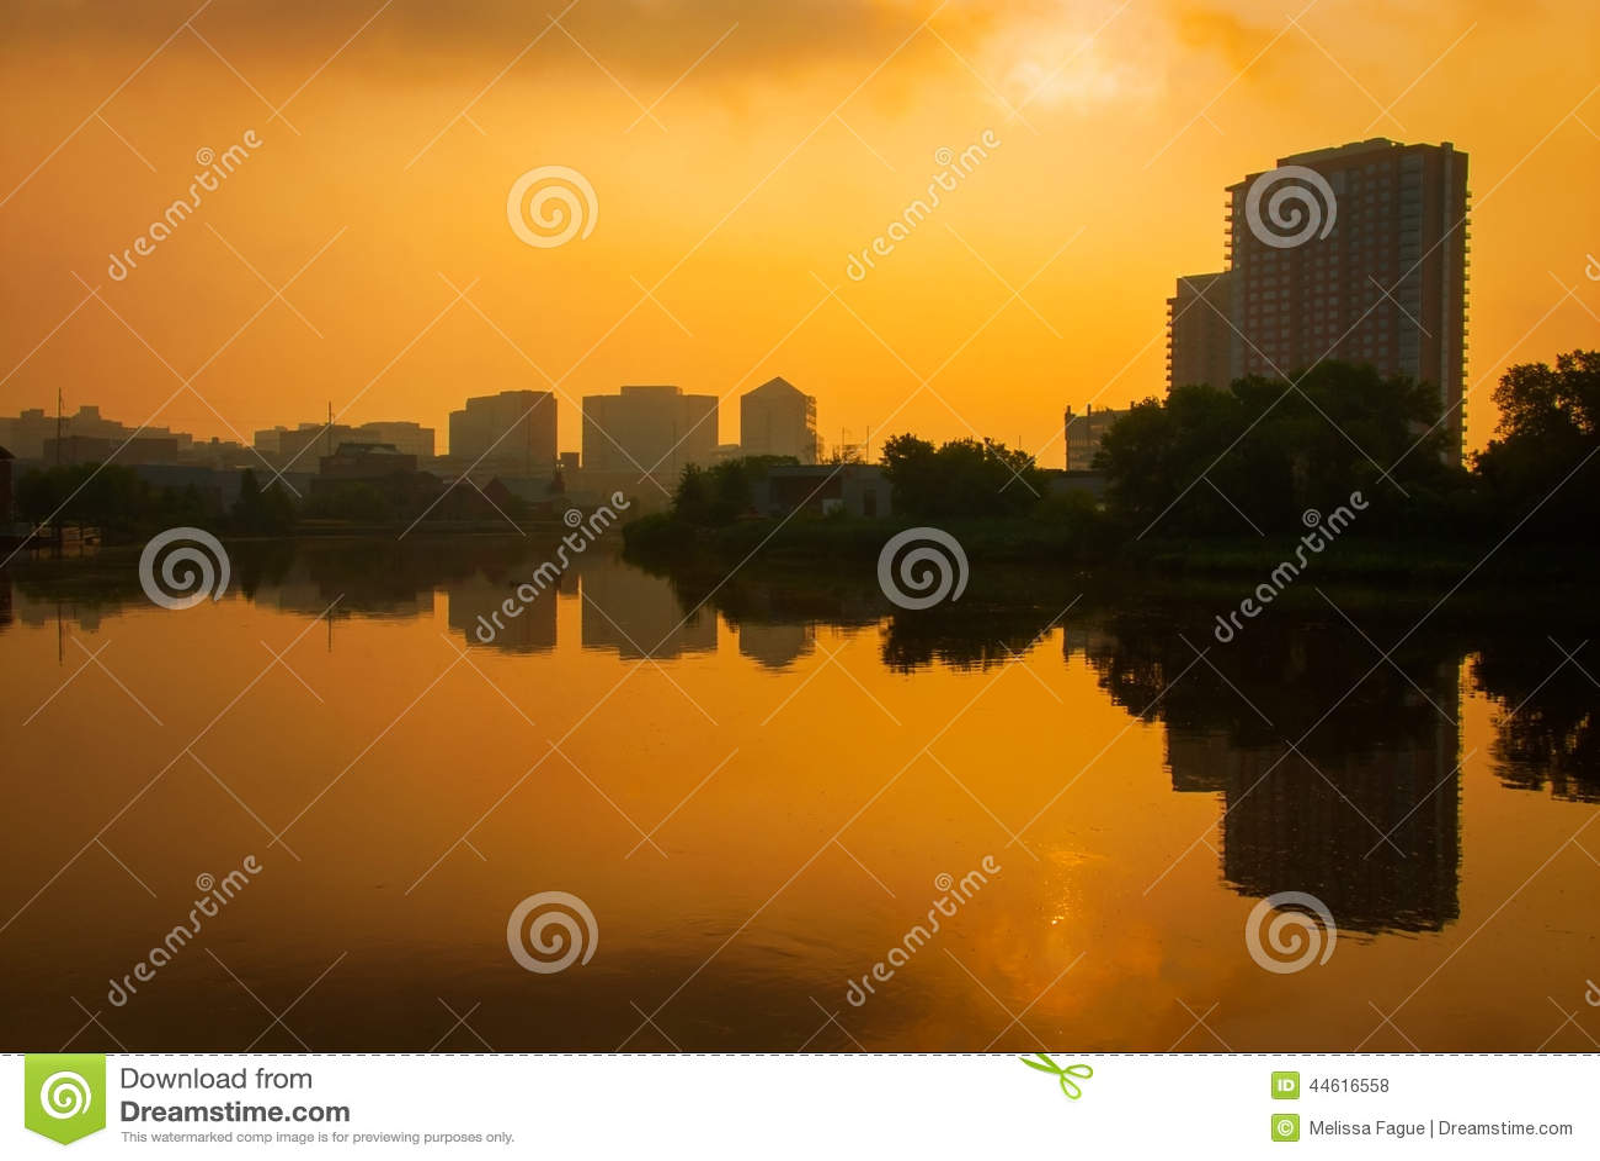 Wilmington bei Sonnenaufgang